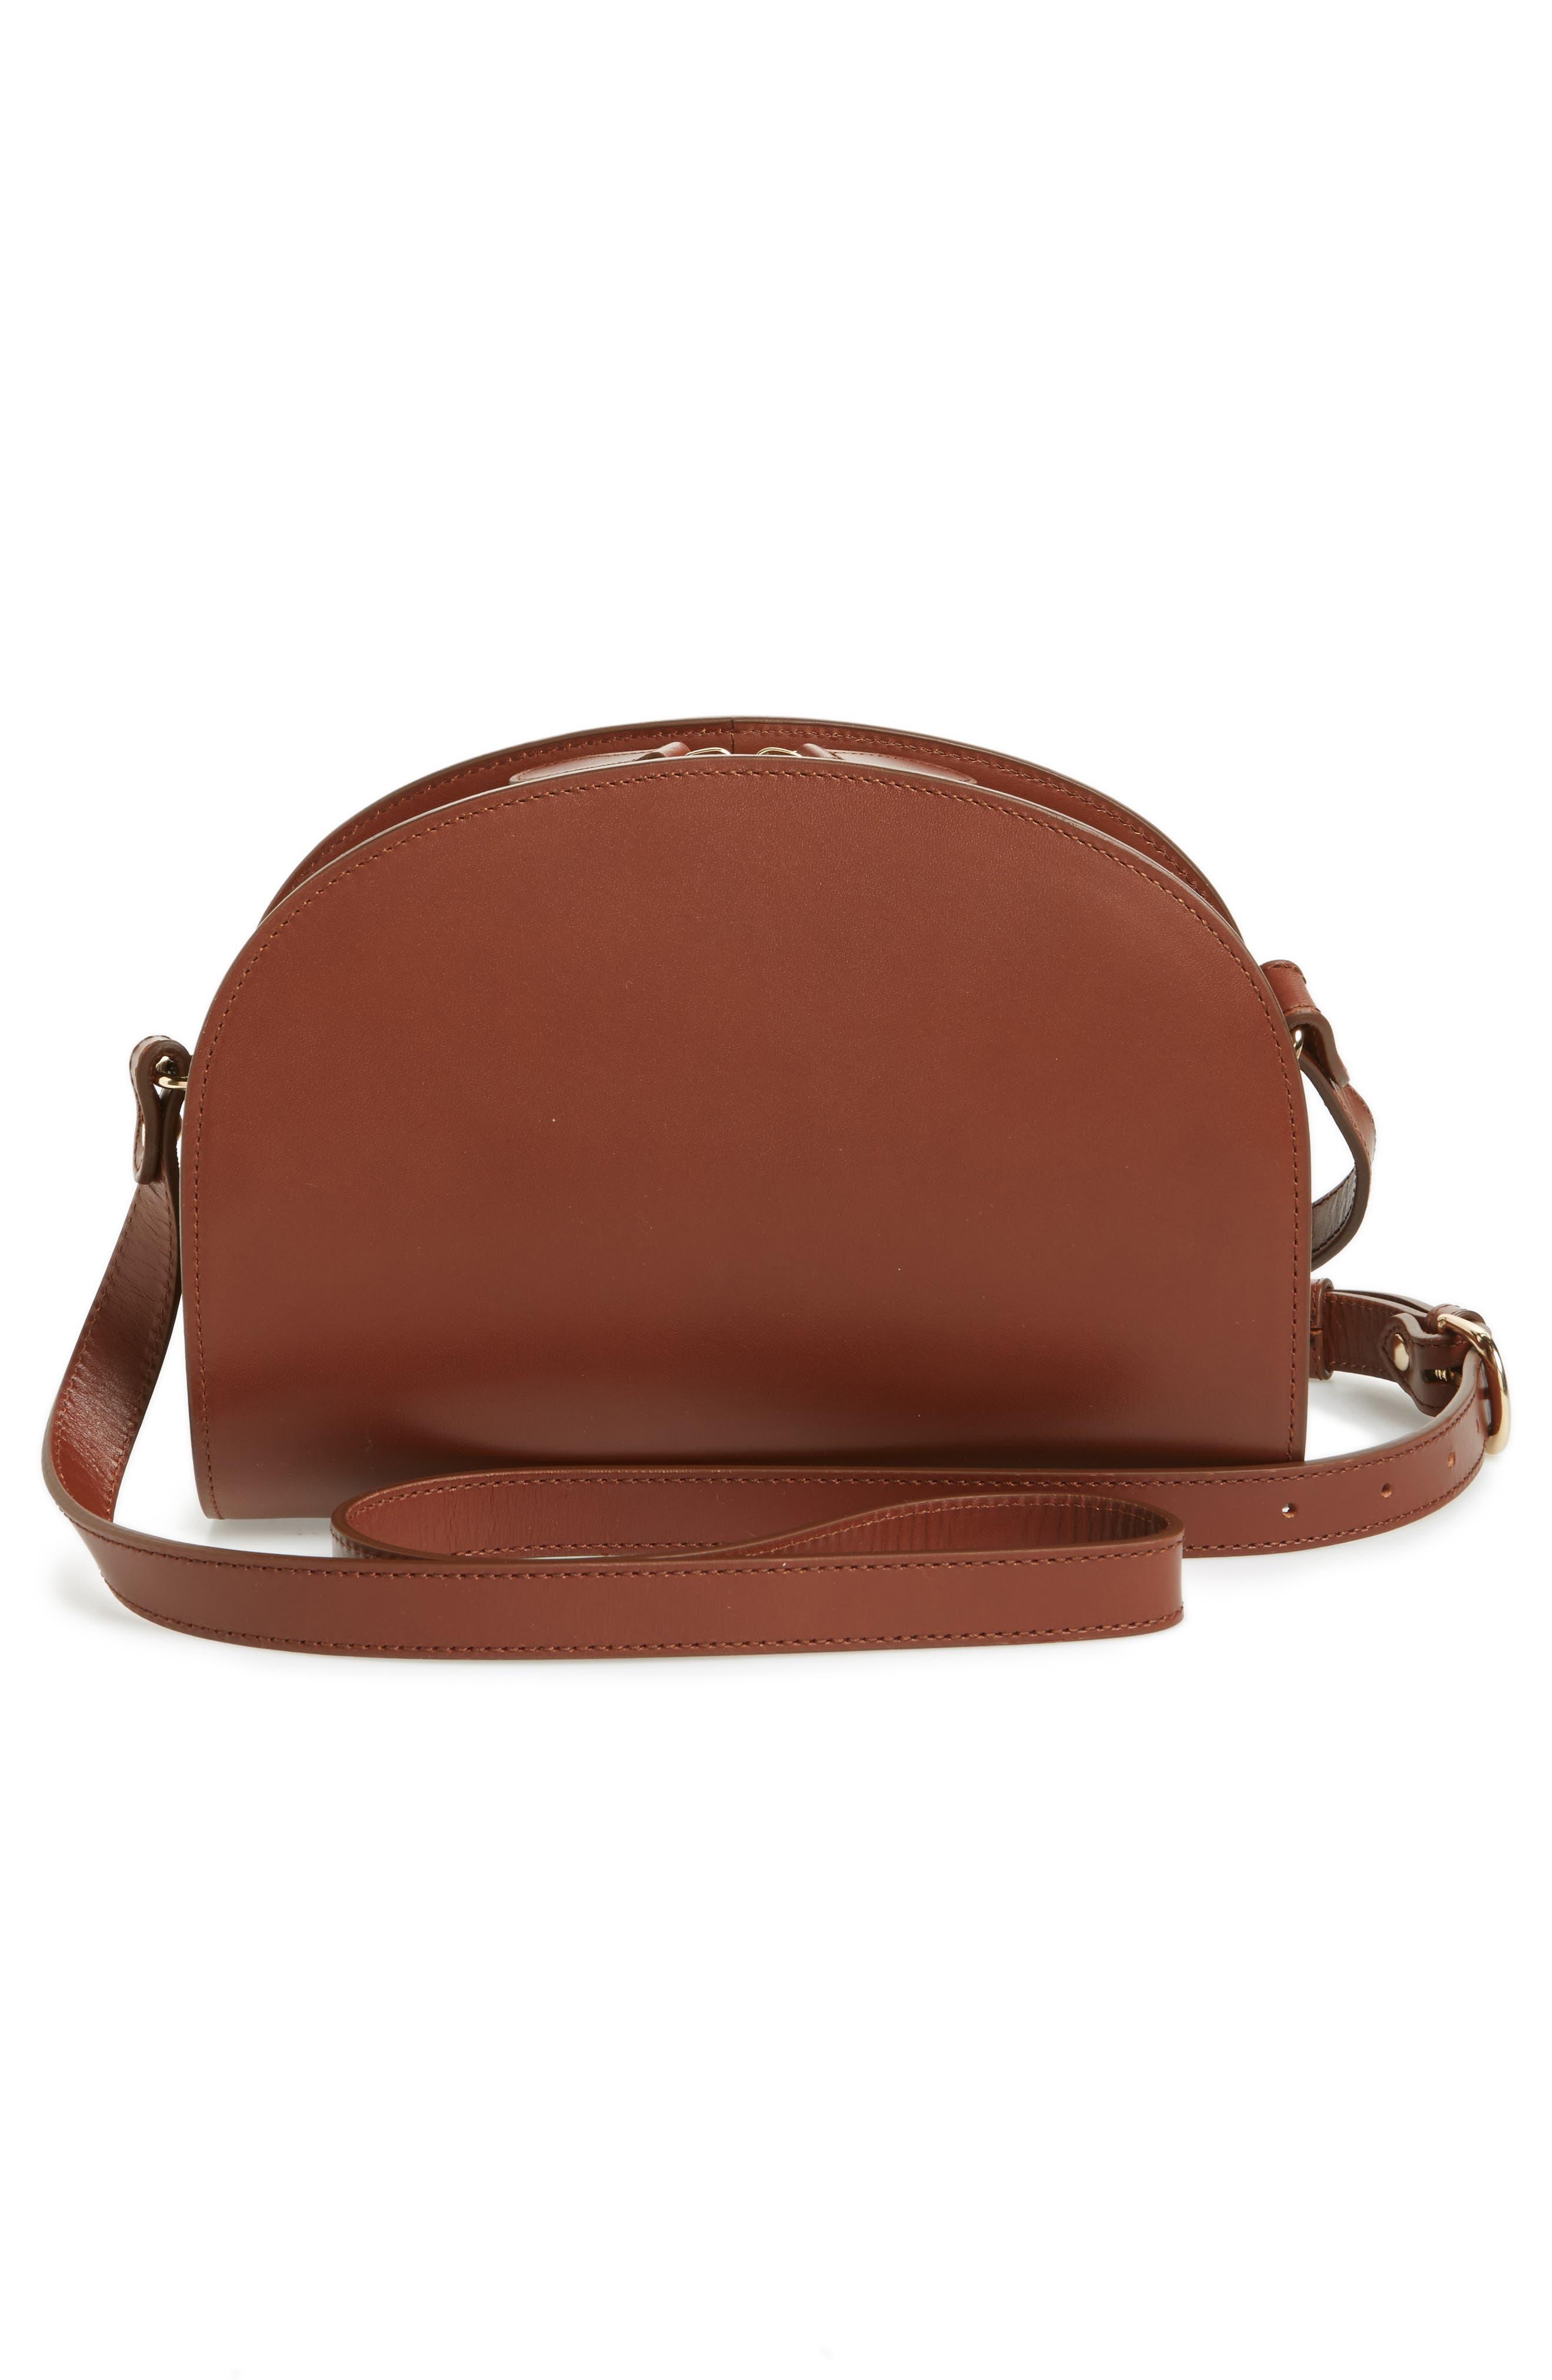 A.P.C., 'Sac Demi Lune' Leather Crossbody Bag, Alternate thumbnail 4, color, NOISETTE